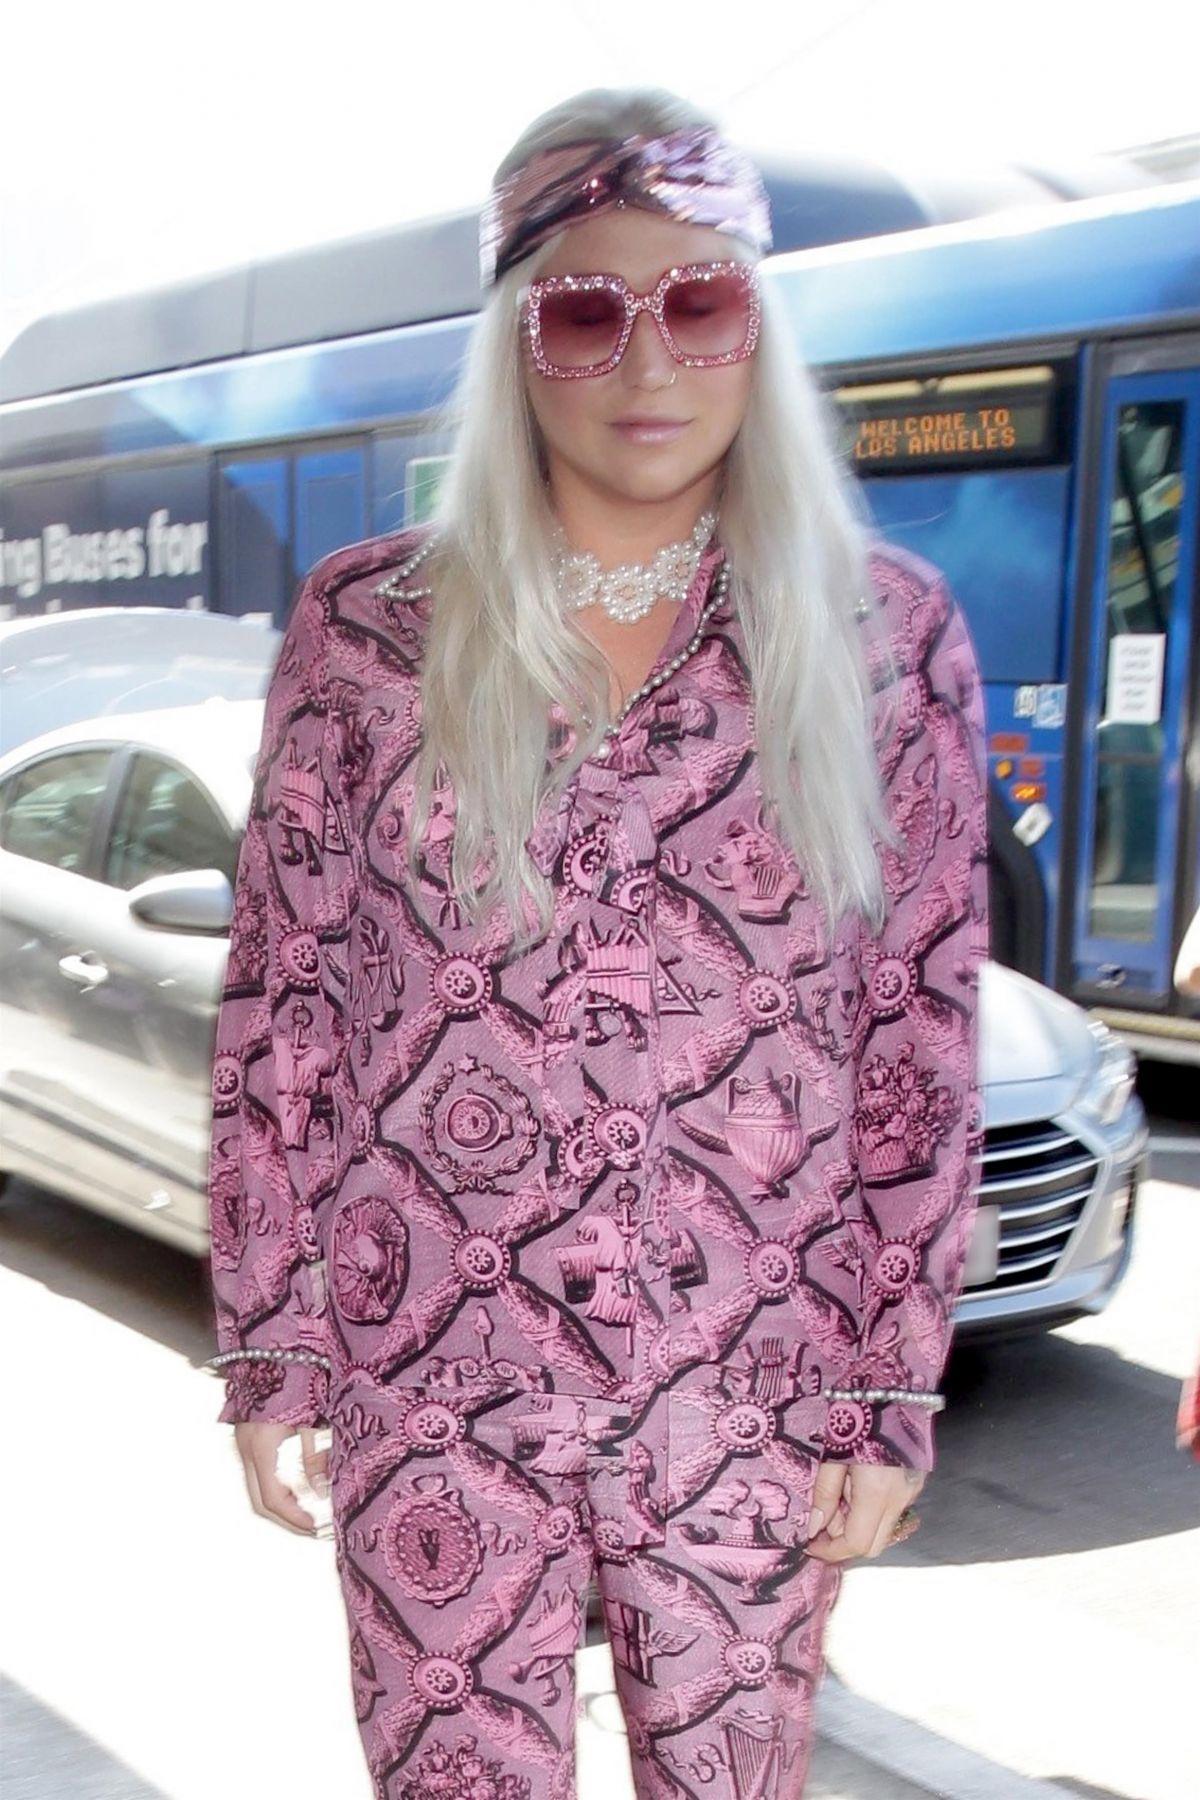 KESHA SEBERT at Los Angeles International Airport 07/02/2017